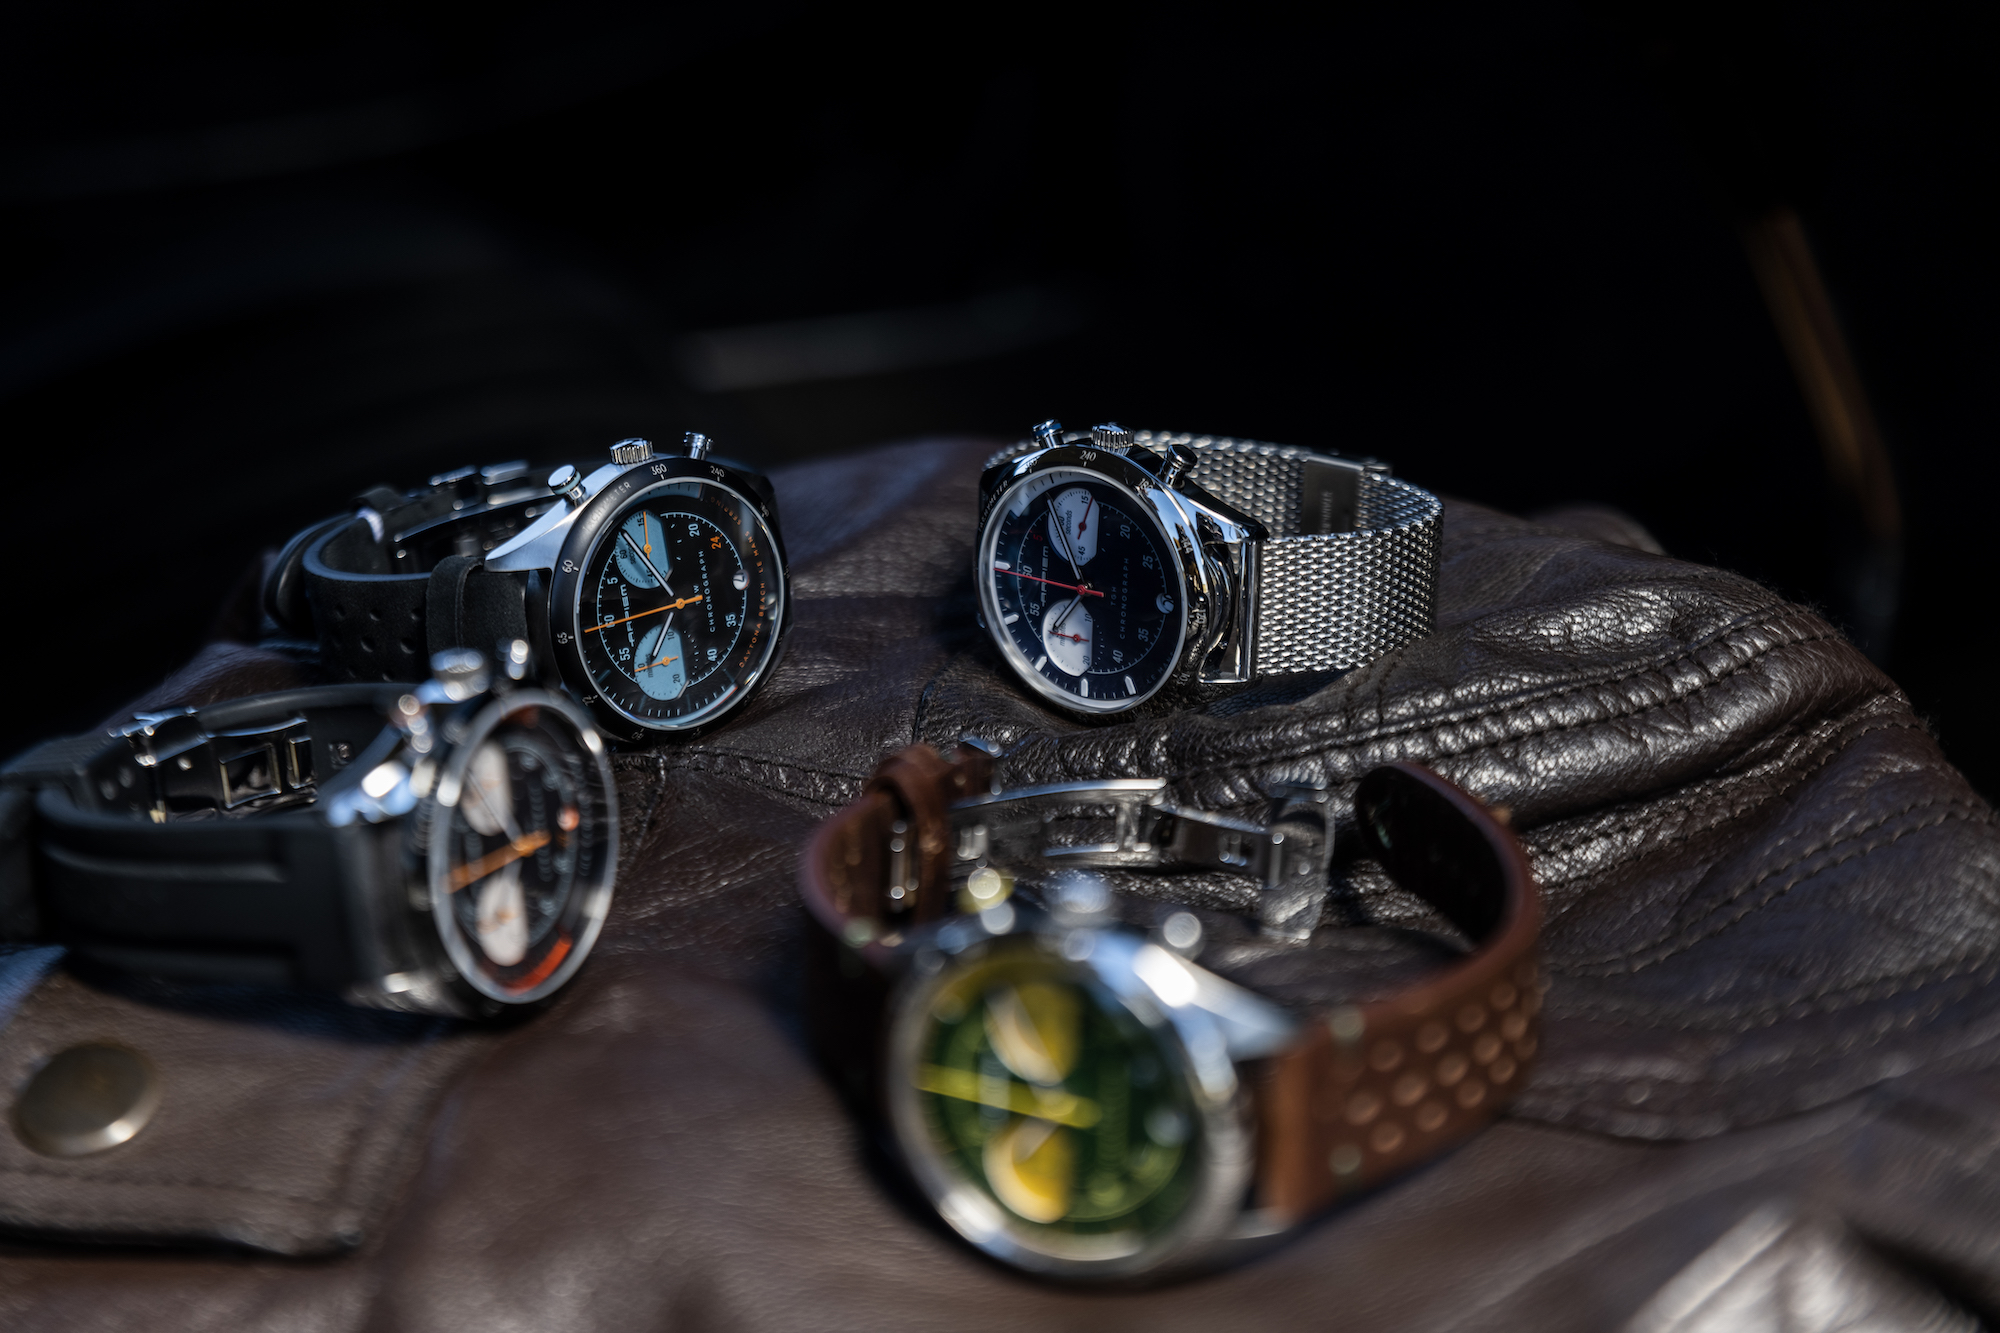 Collection montres Arpiem